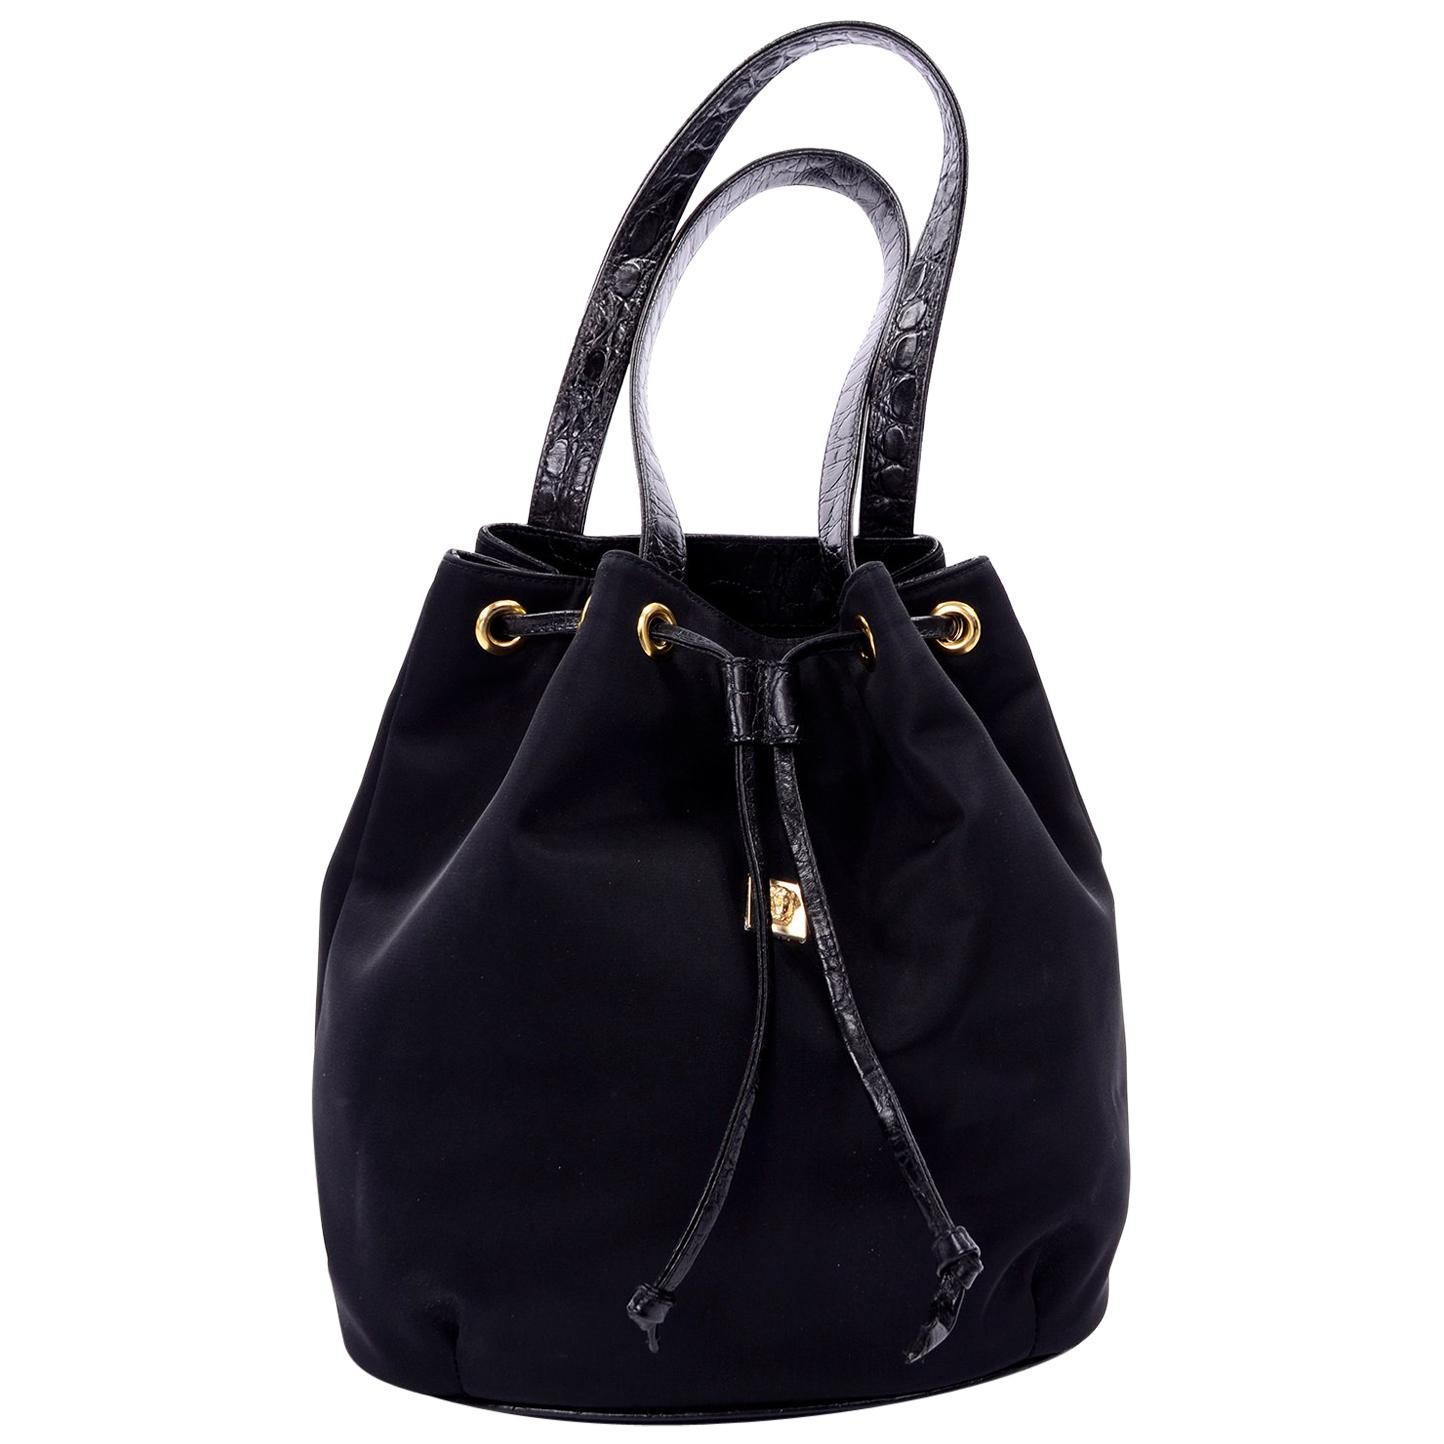 Gianni Versace Couture Handbag Vintage Black Drawstring Bag W/ Medusa Head